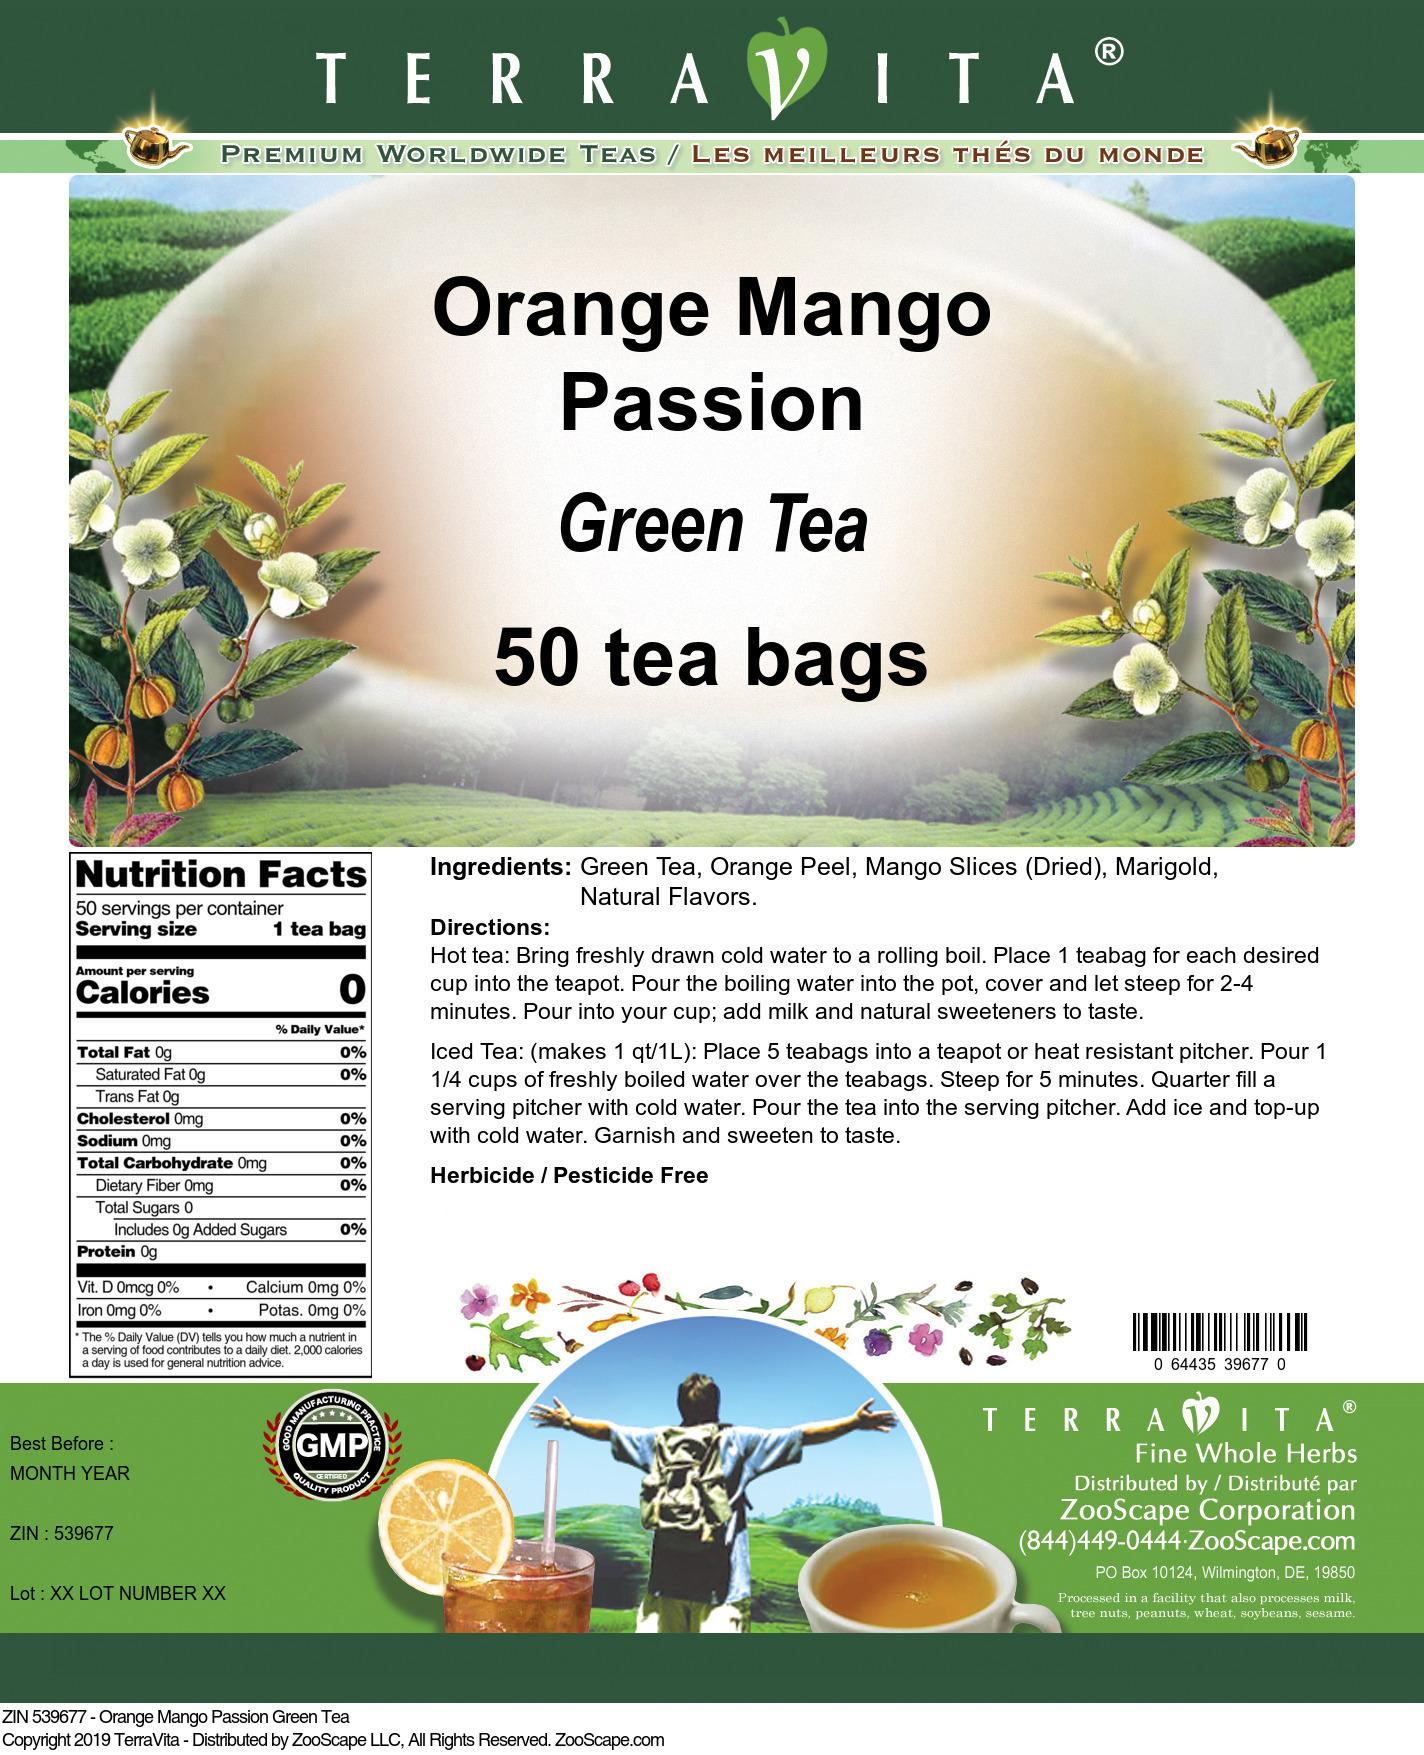 Orange Mango Passion Green Tea